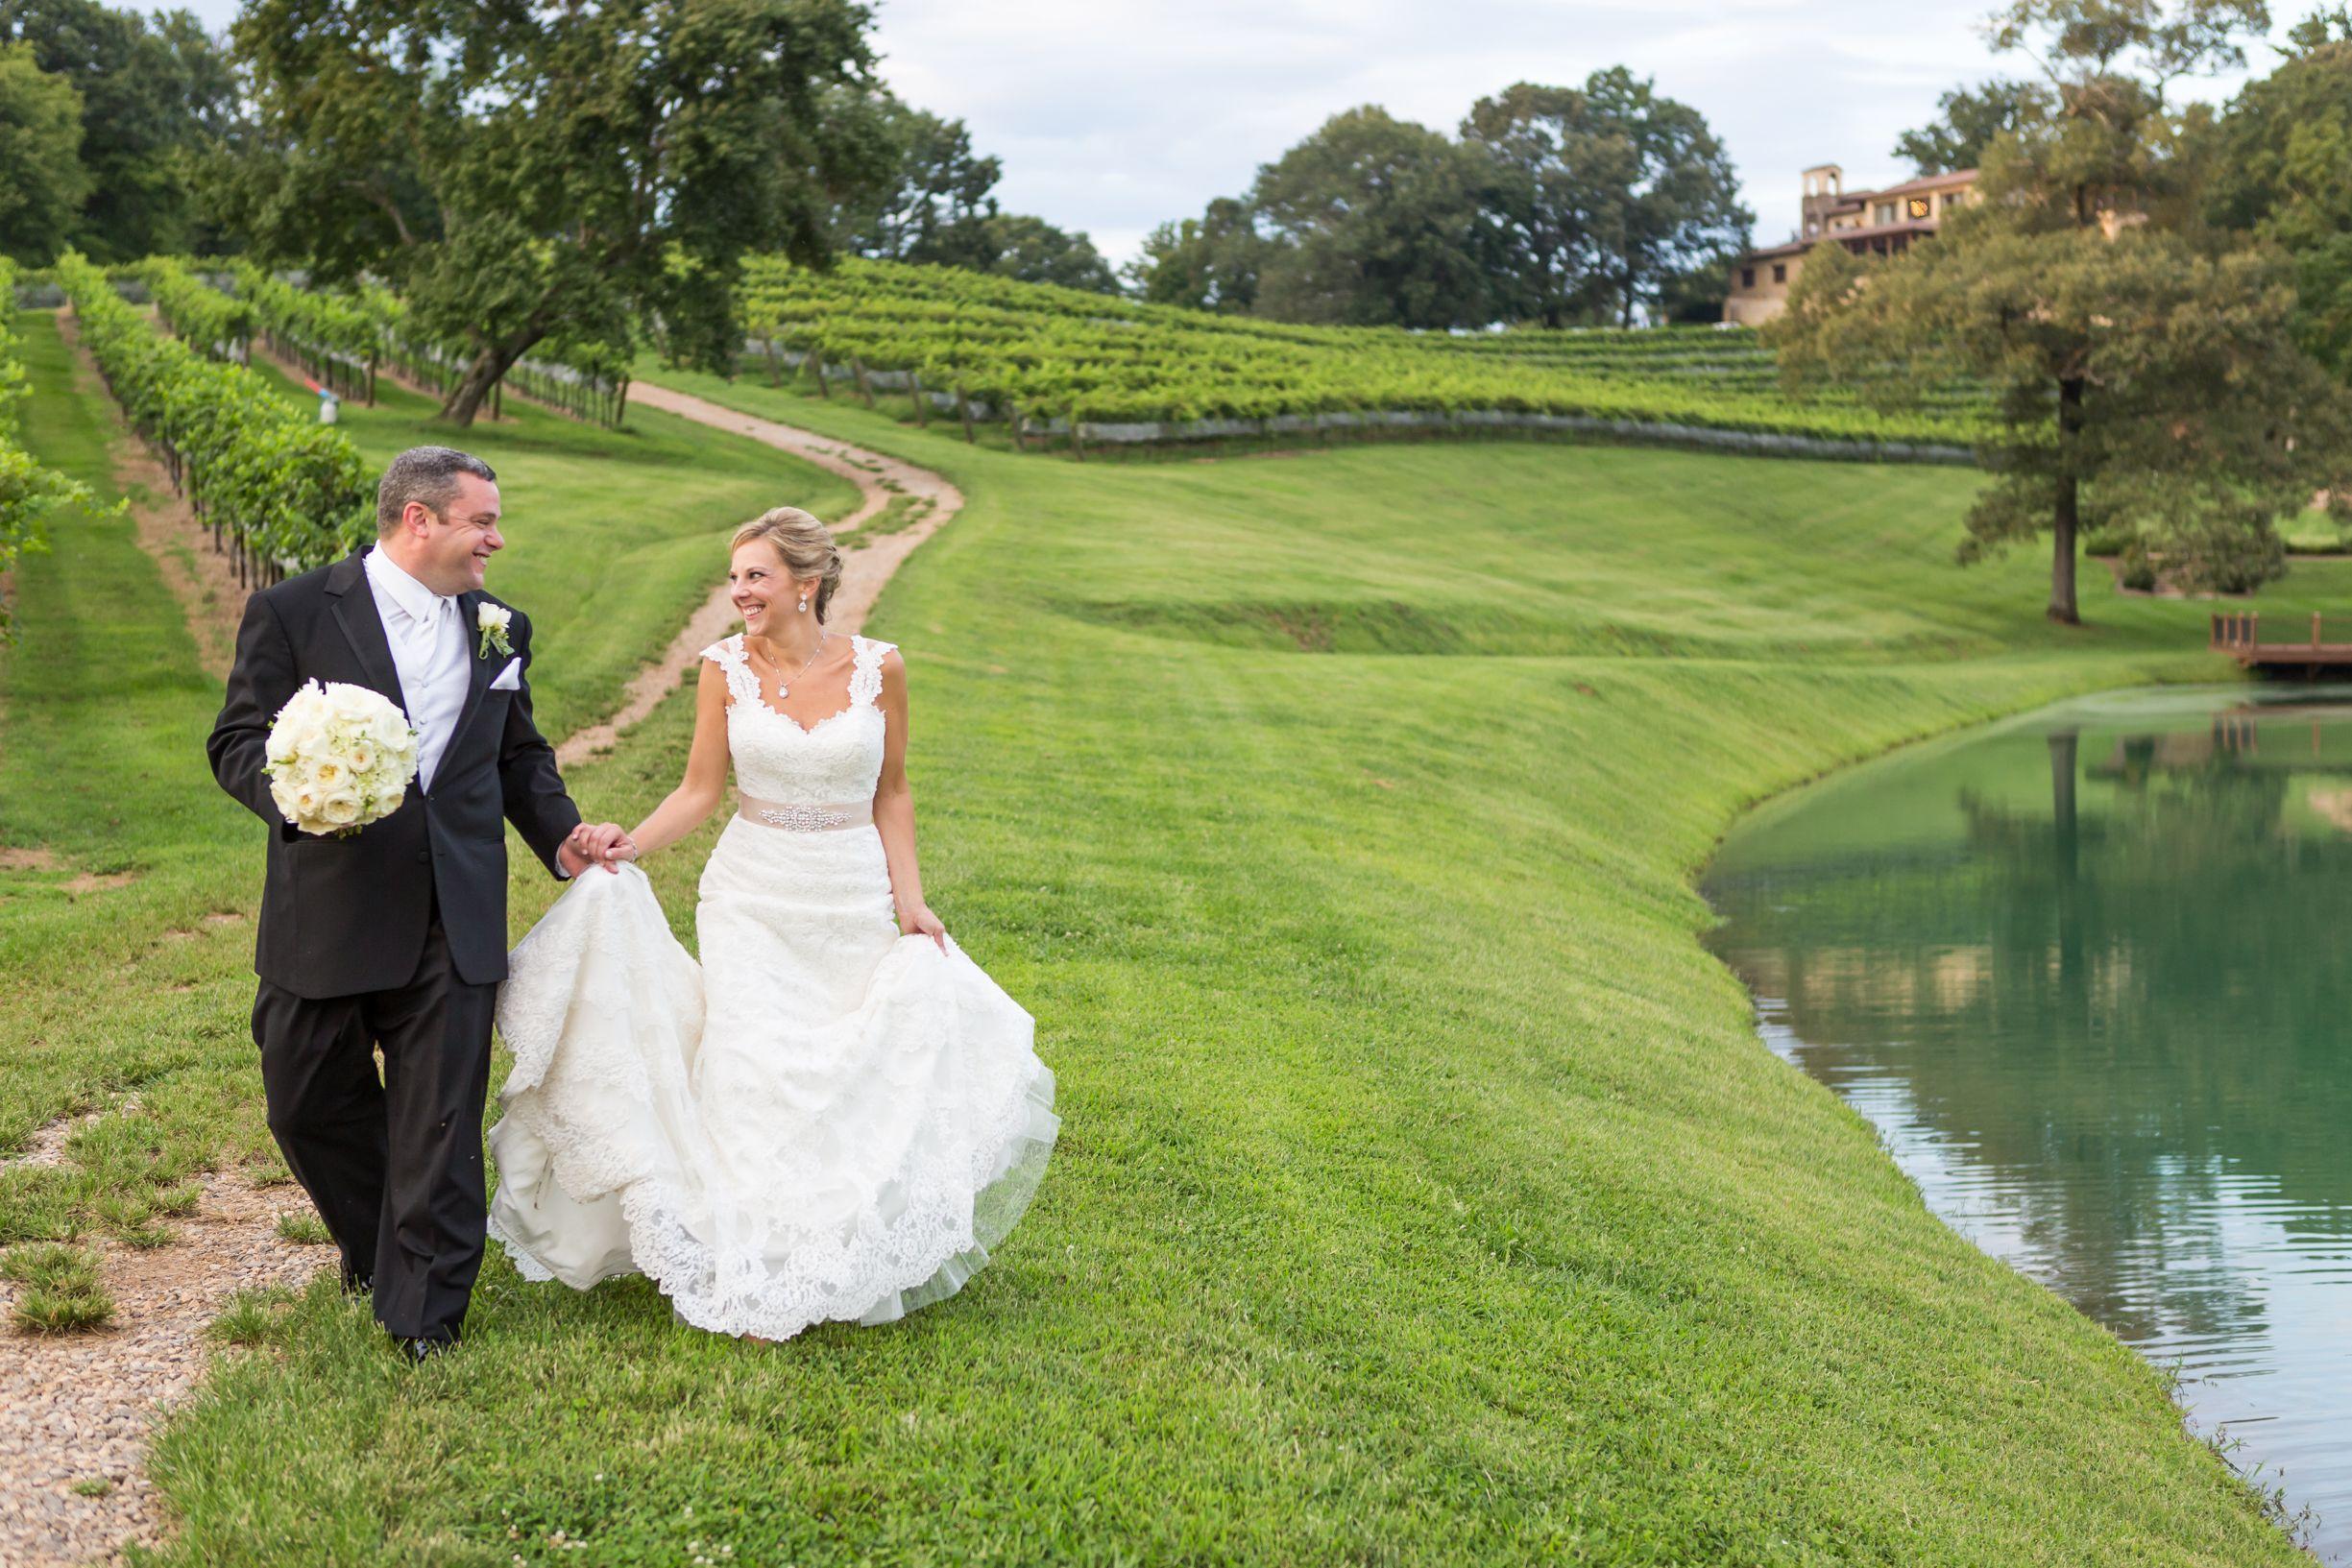 A Stylish Vineyard Wedding at Montaluce Winery and